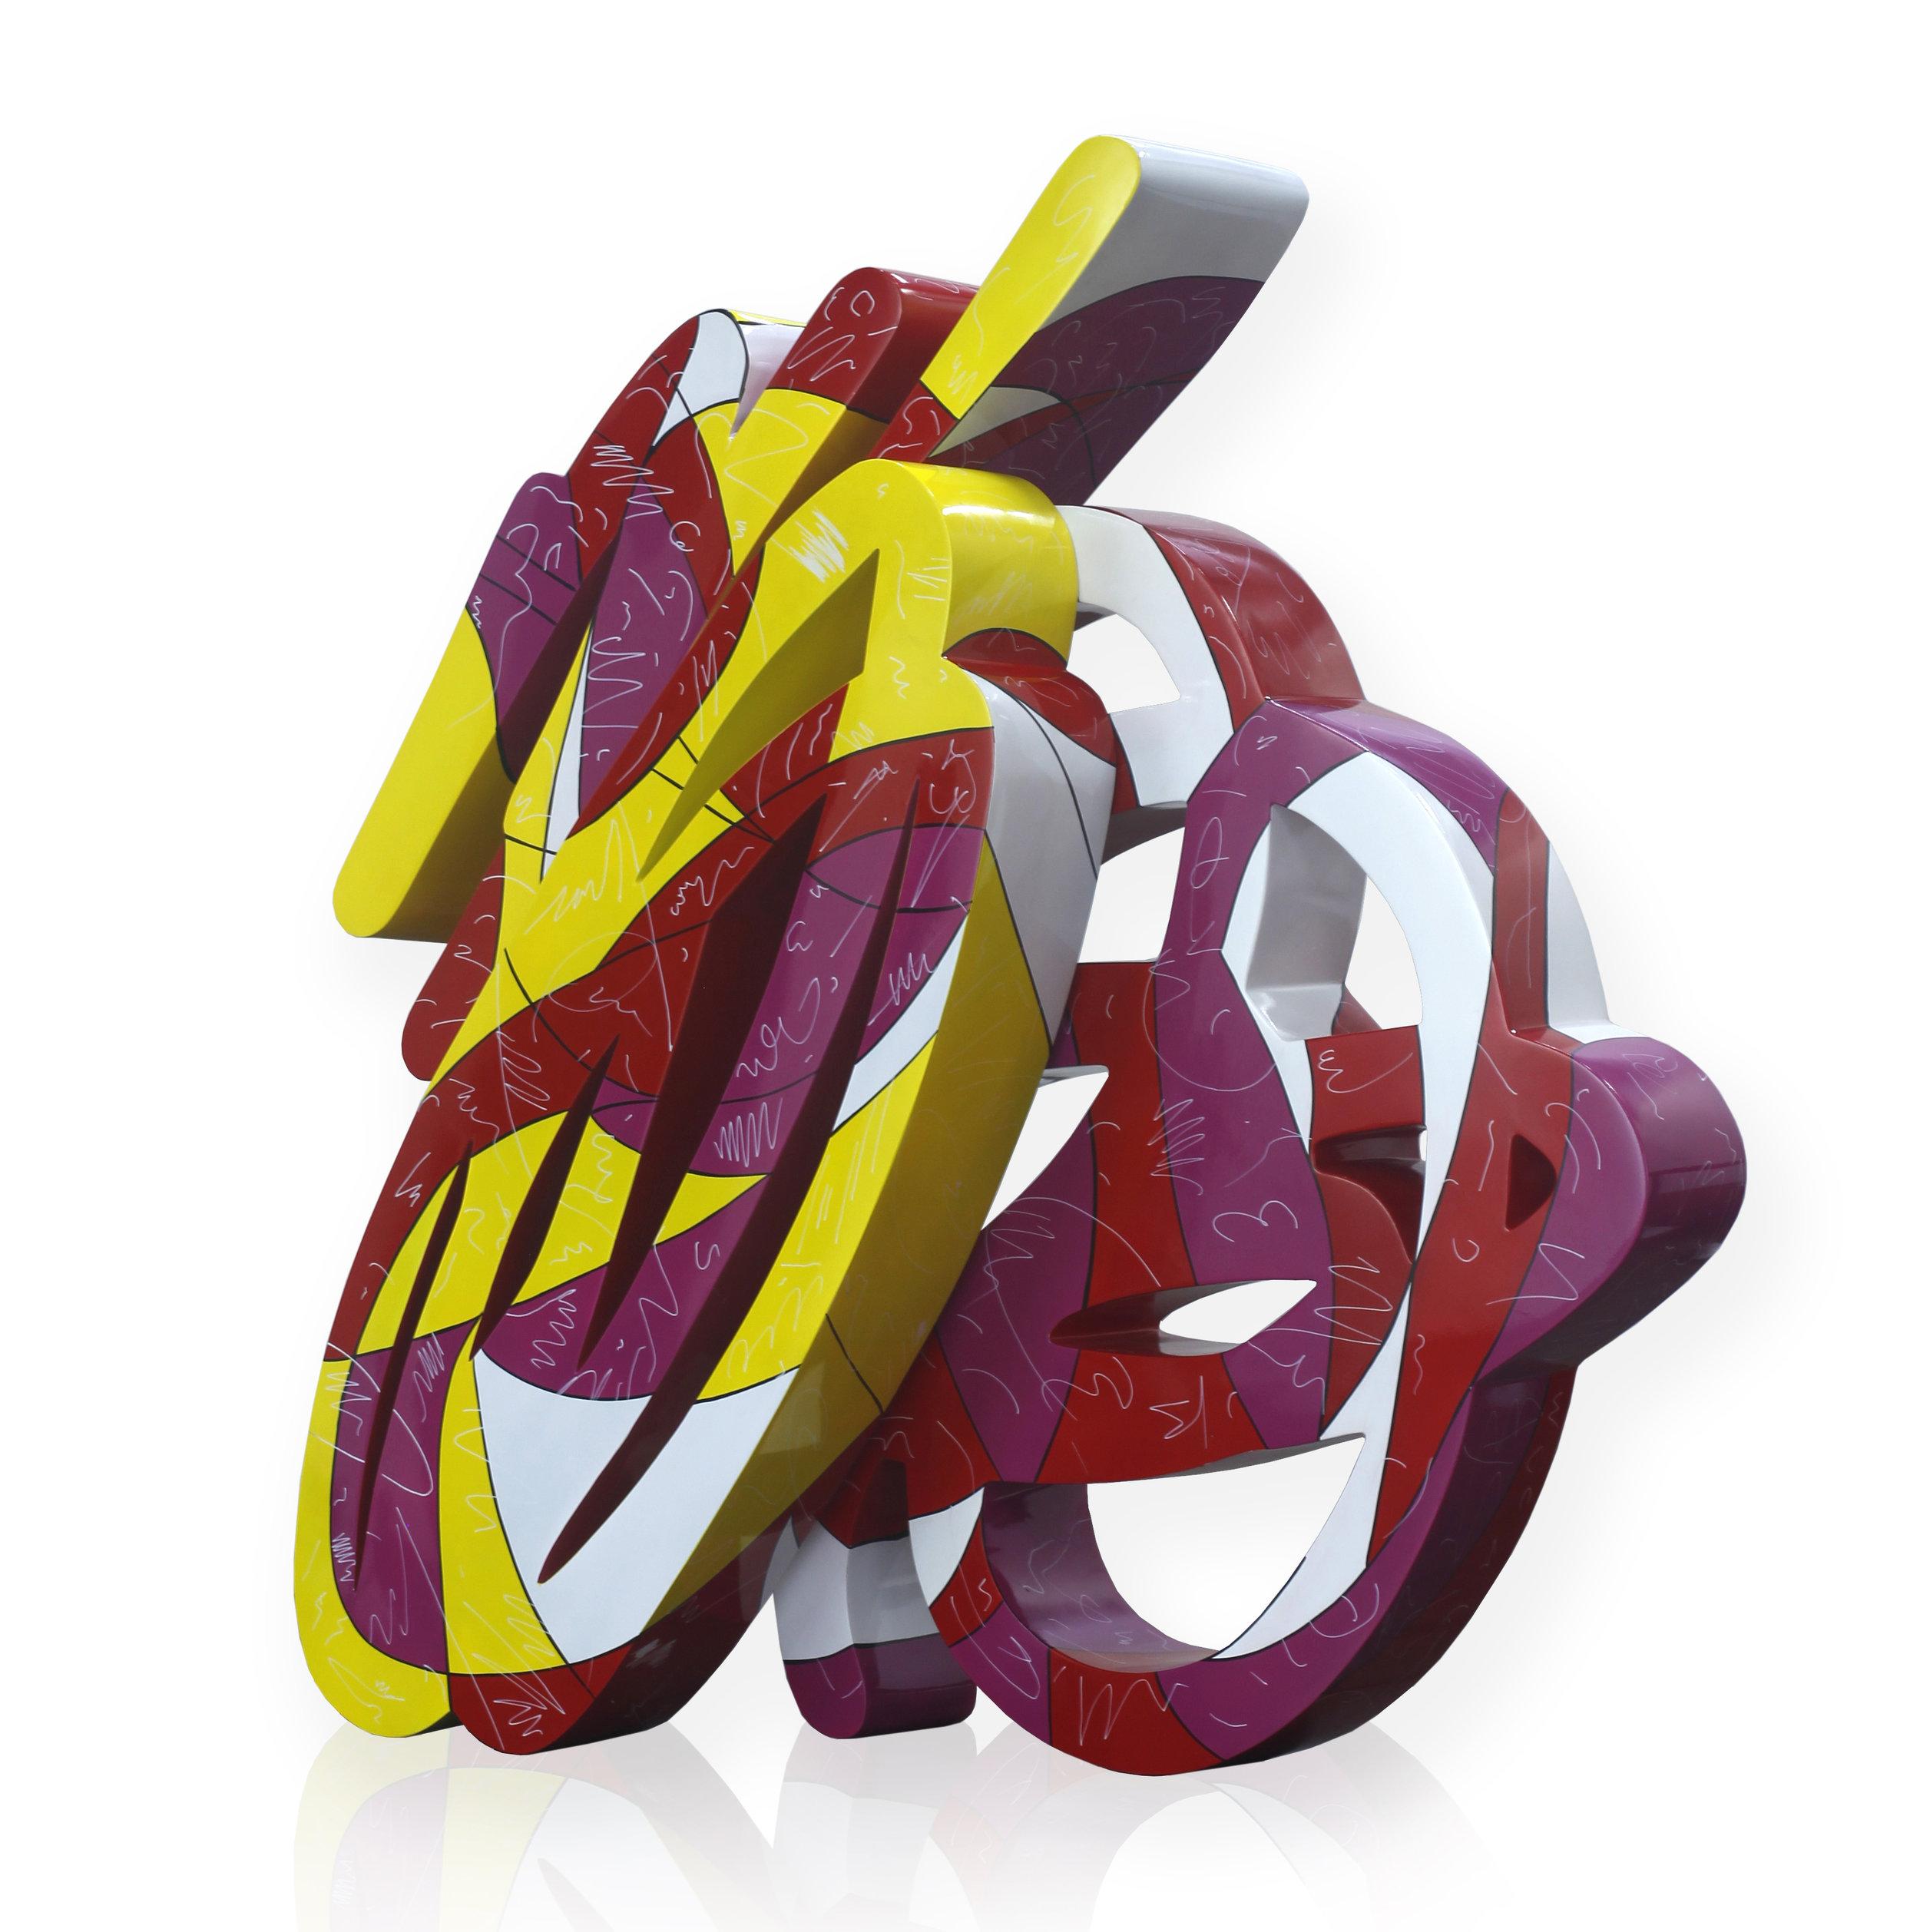 Artist: Erwin Windu Pranata, Indonesia  Title: The Stroke #13 Medium: polyurethane paint on steel sheet Dimension: 150 X 45 X 160 cm Year: 2019